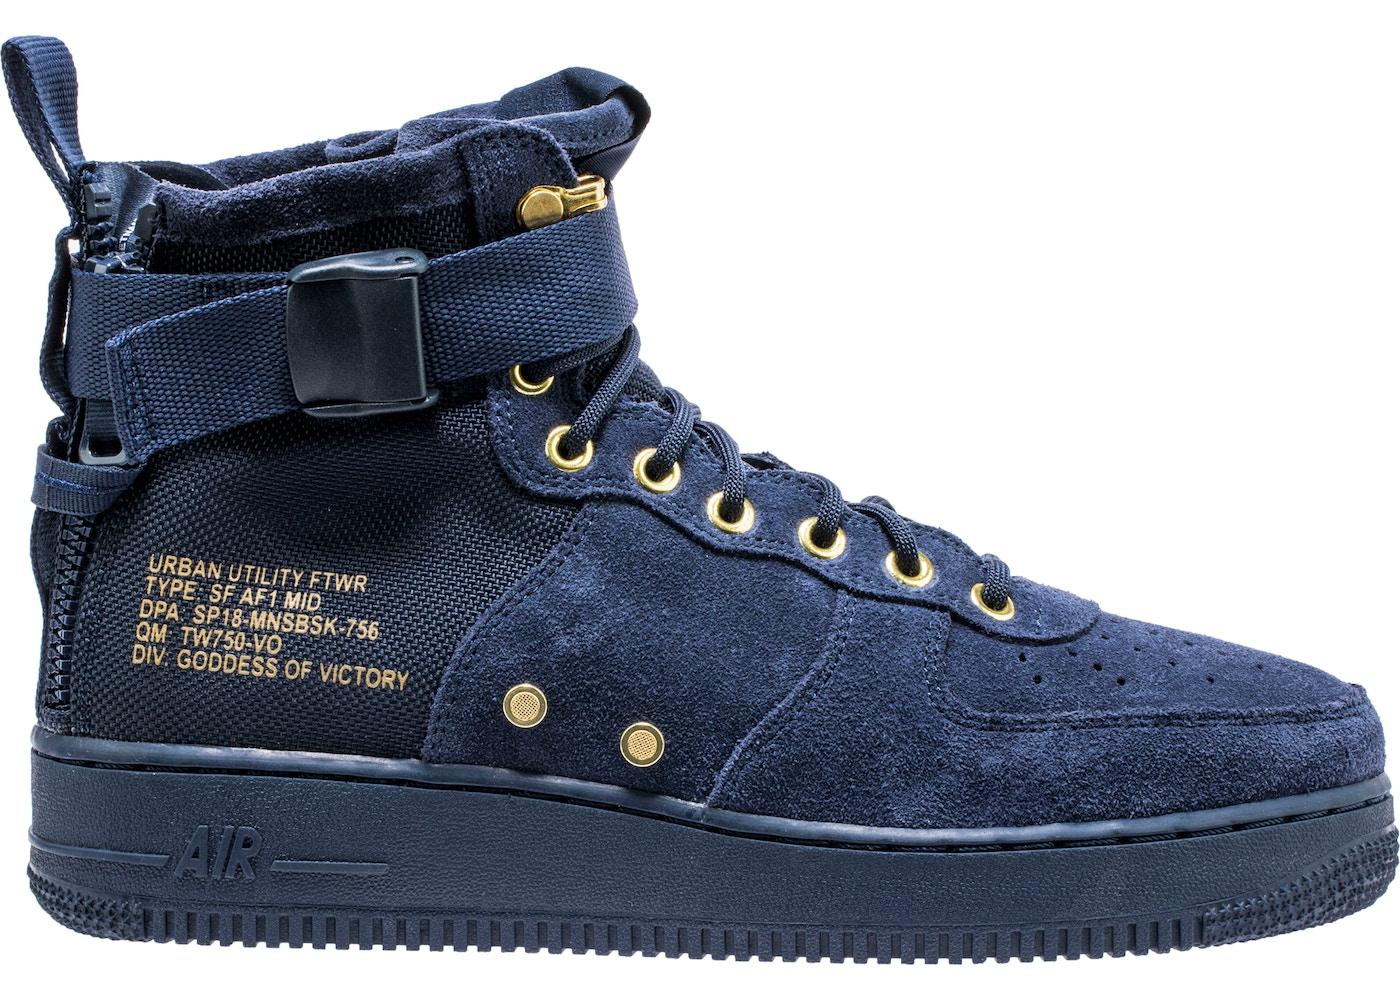 cheap for discount 1ac66 194ca Nike SF Air Force 1 Mid Obsidian Metallic Gold - 917753-400